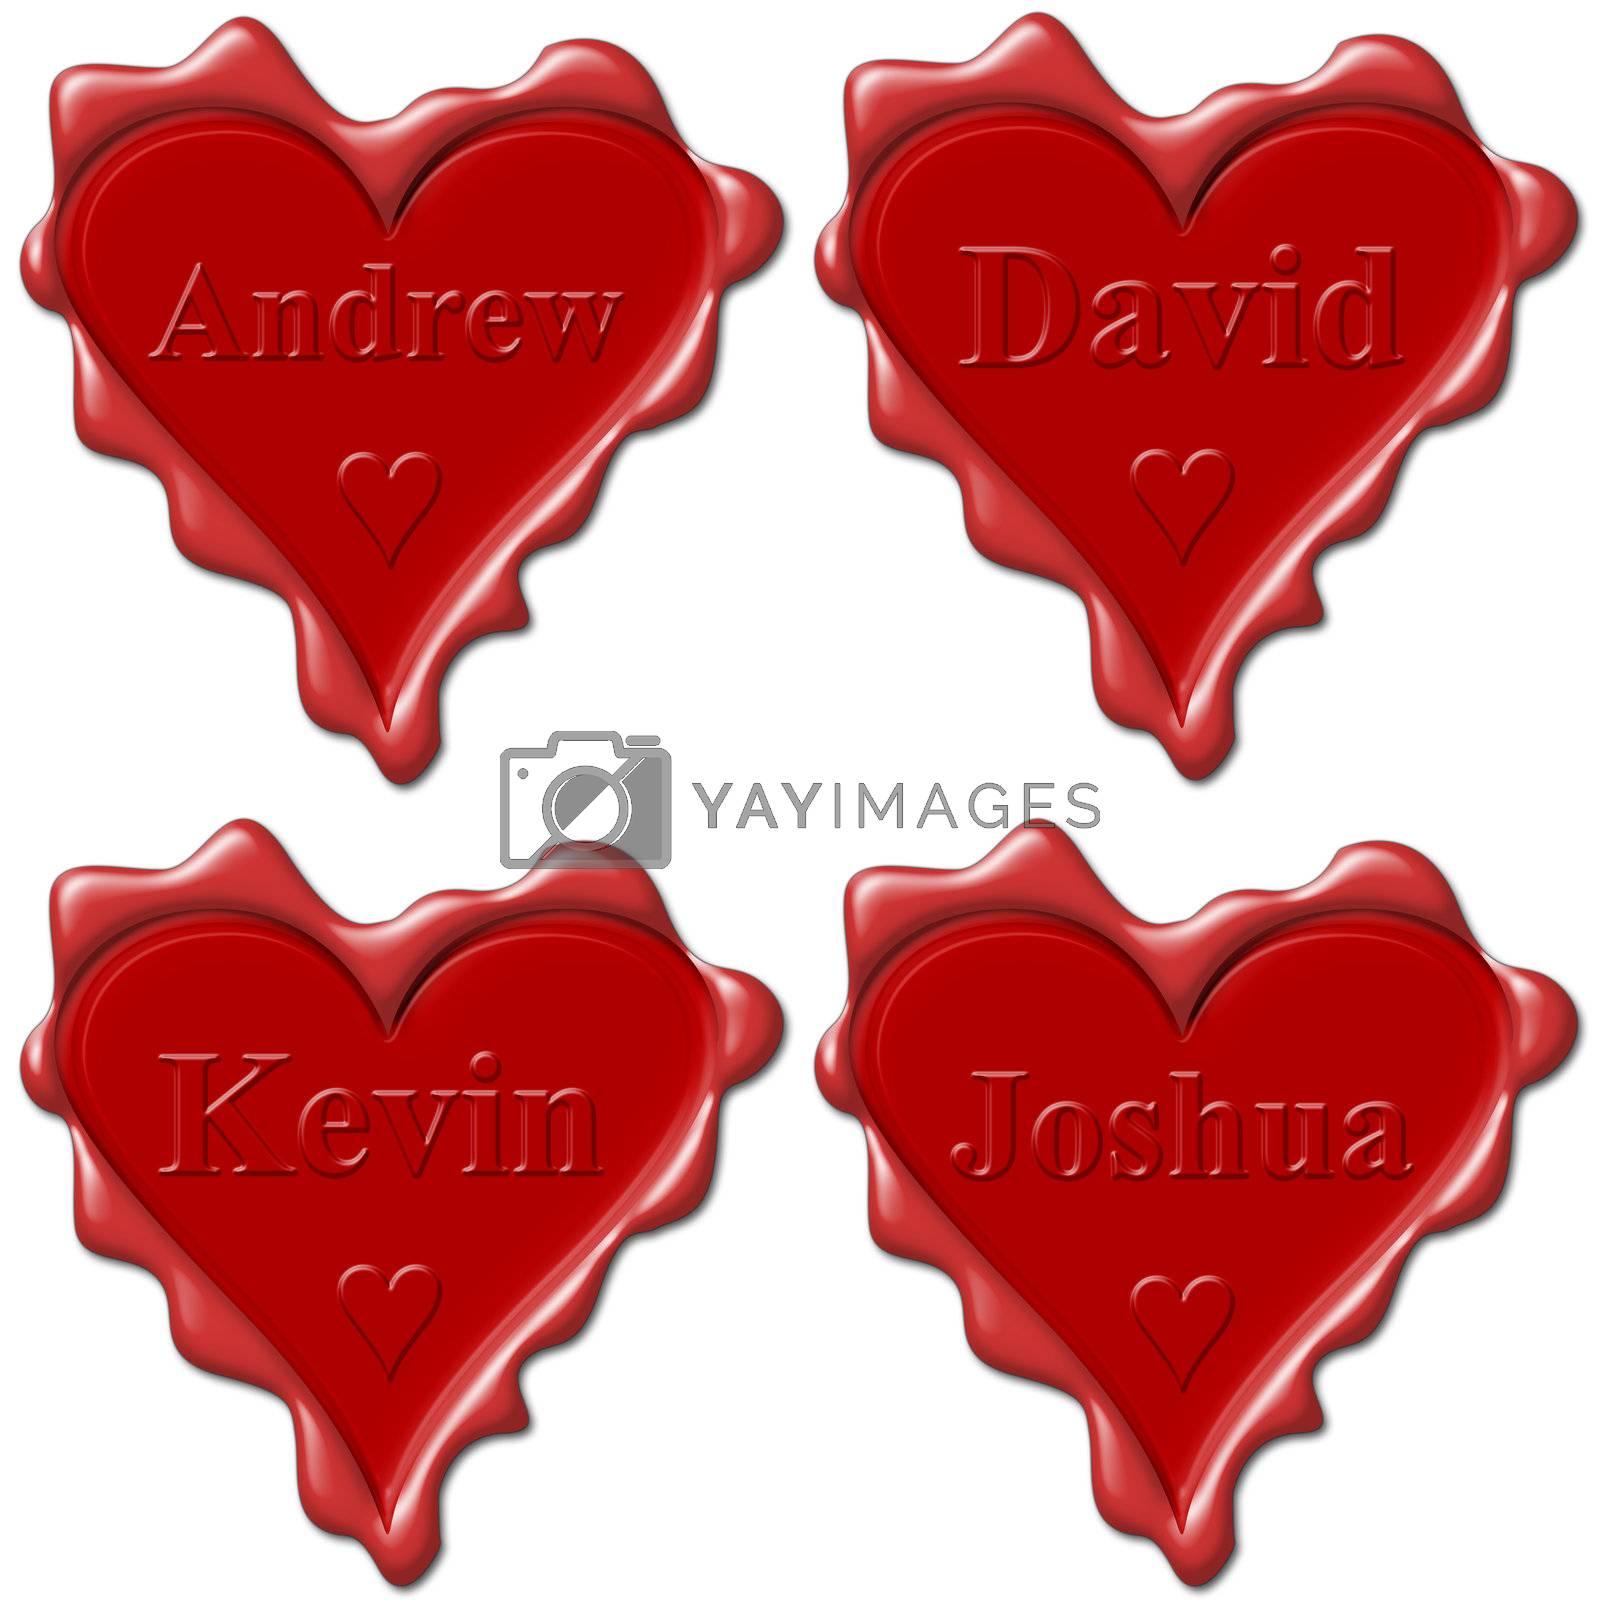 Valentine love hearts with names: Andrew, David, Kevin, Joshua